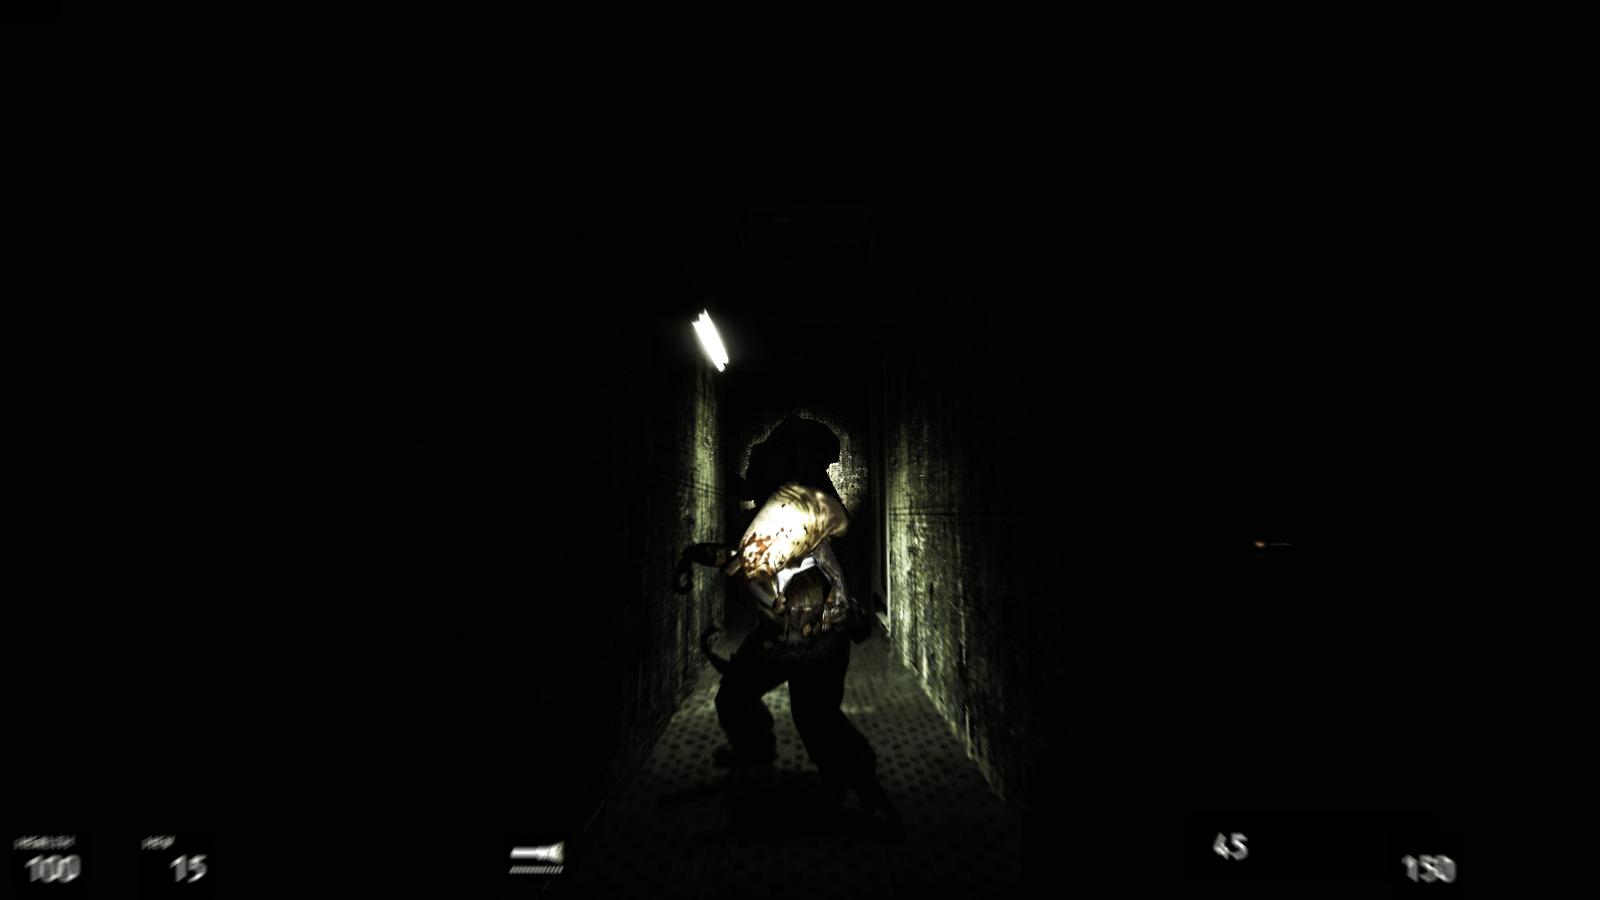 Edited-5 - Half-Life 2